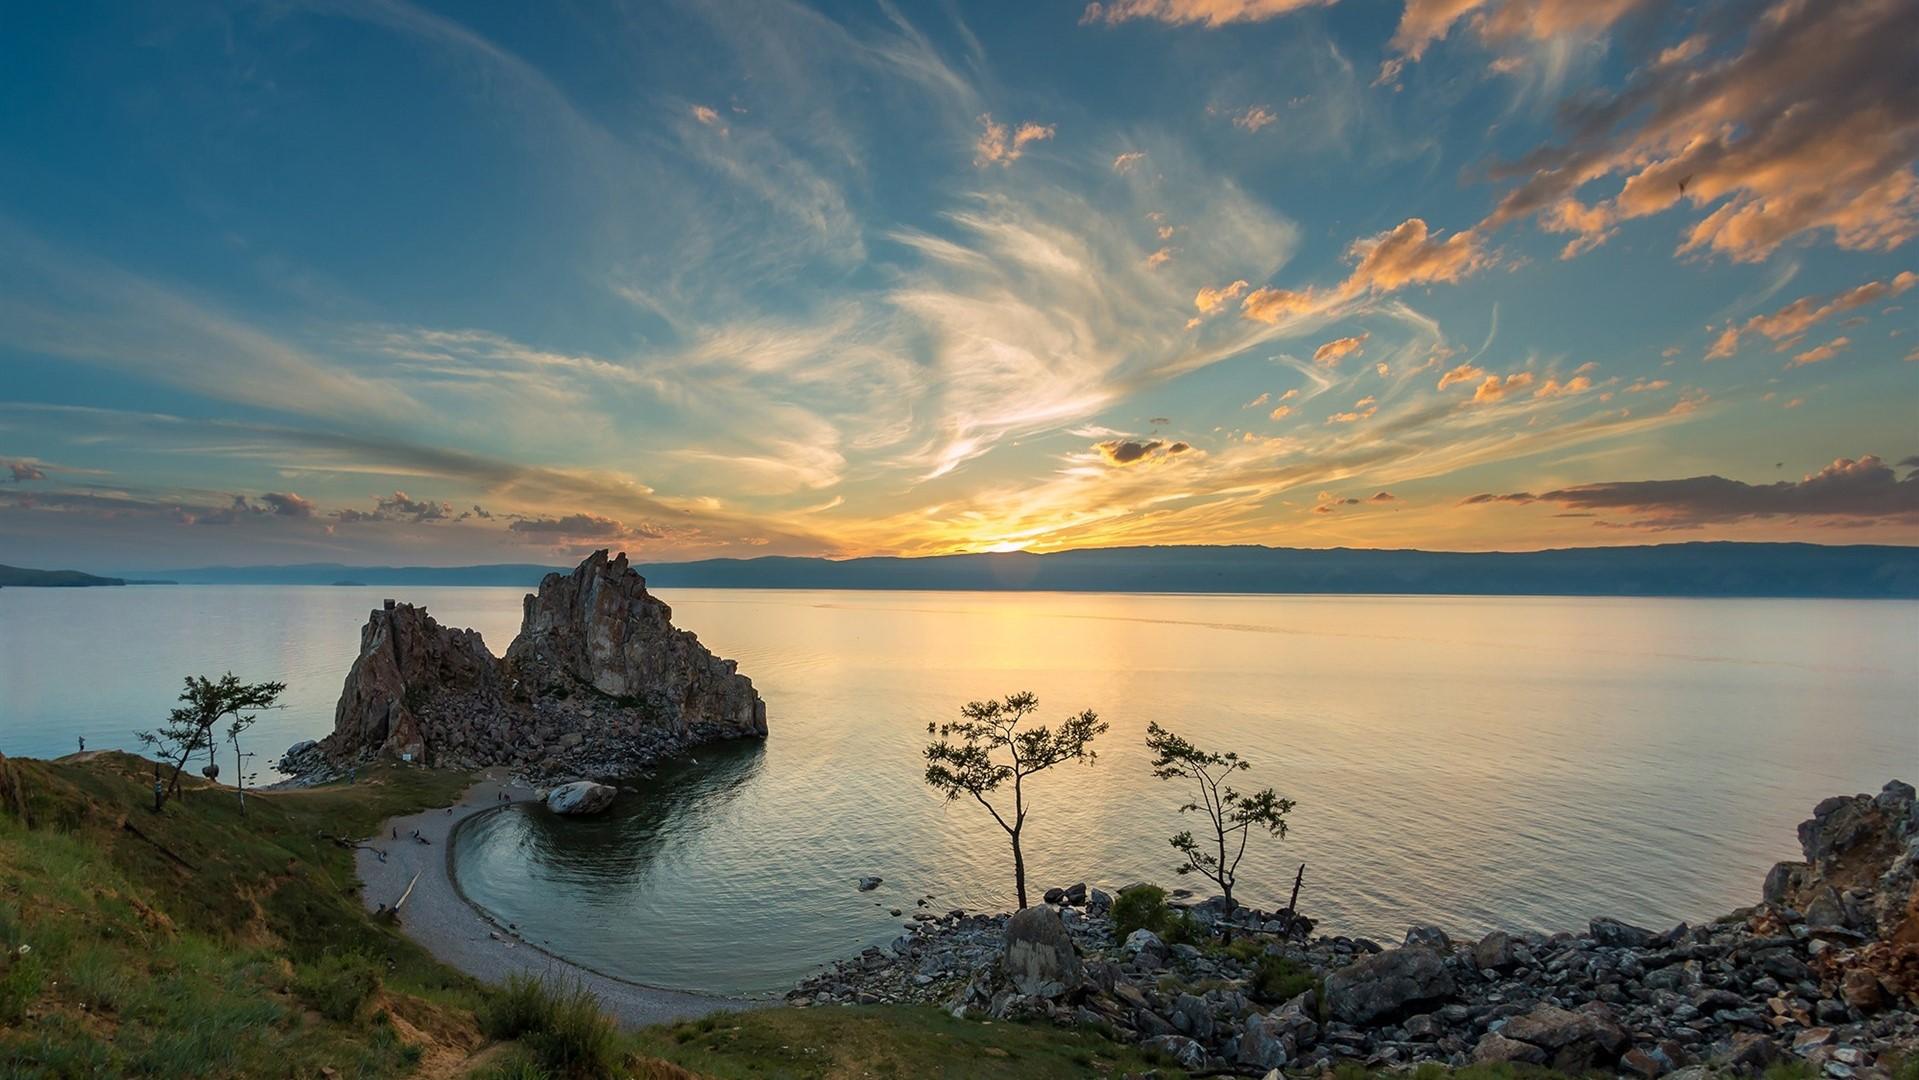 Baikal Lake, Olkhon Island